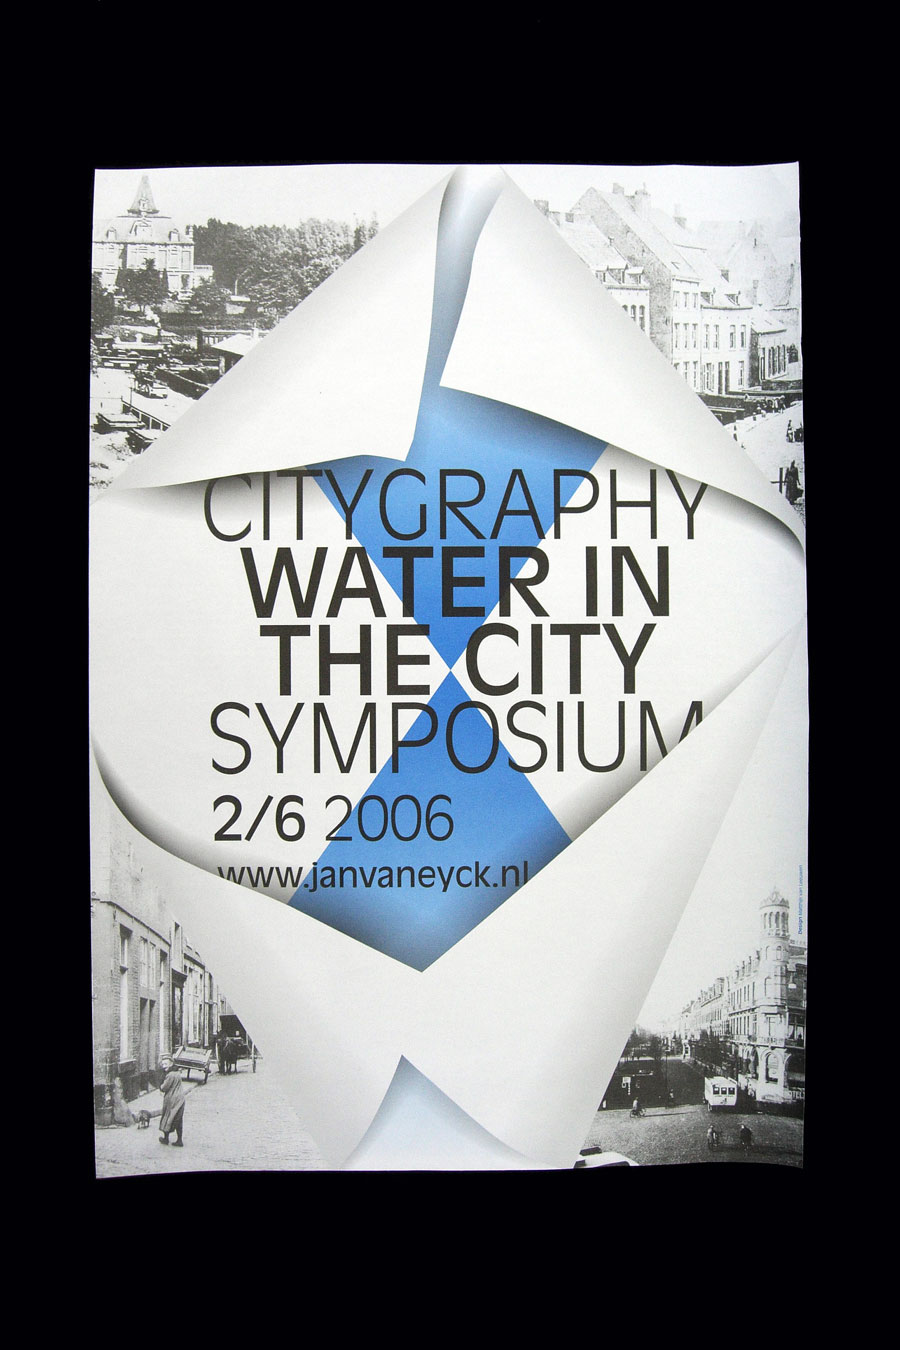 Matthijs Matt van Leeuwen, Citygraphy, Poster, Jan van Eyck